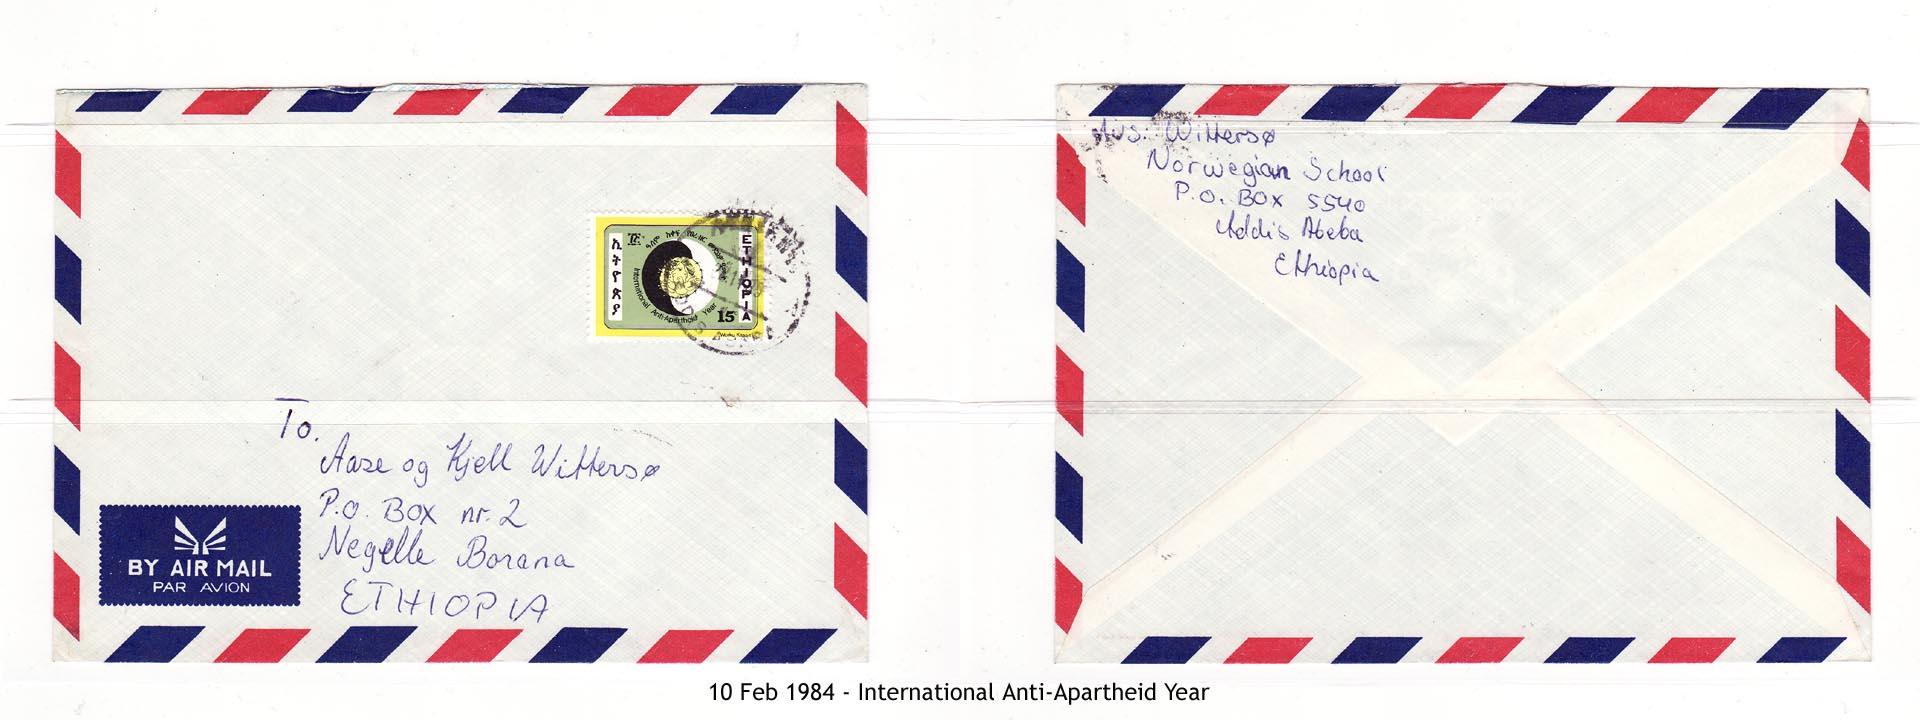 19840210 - International Anti-Apartheid Year